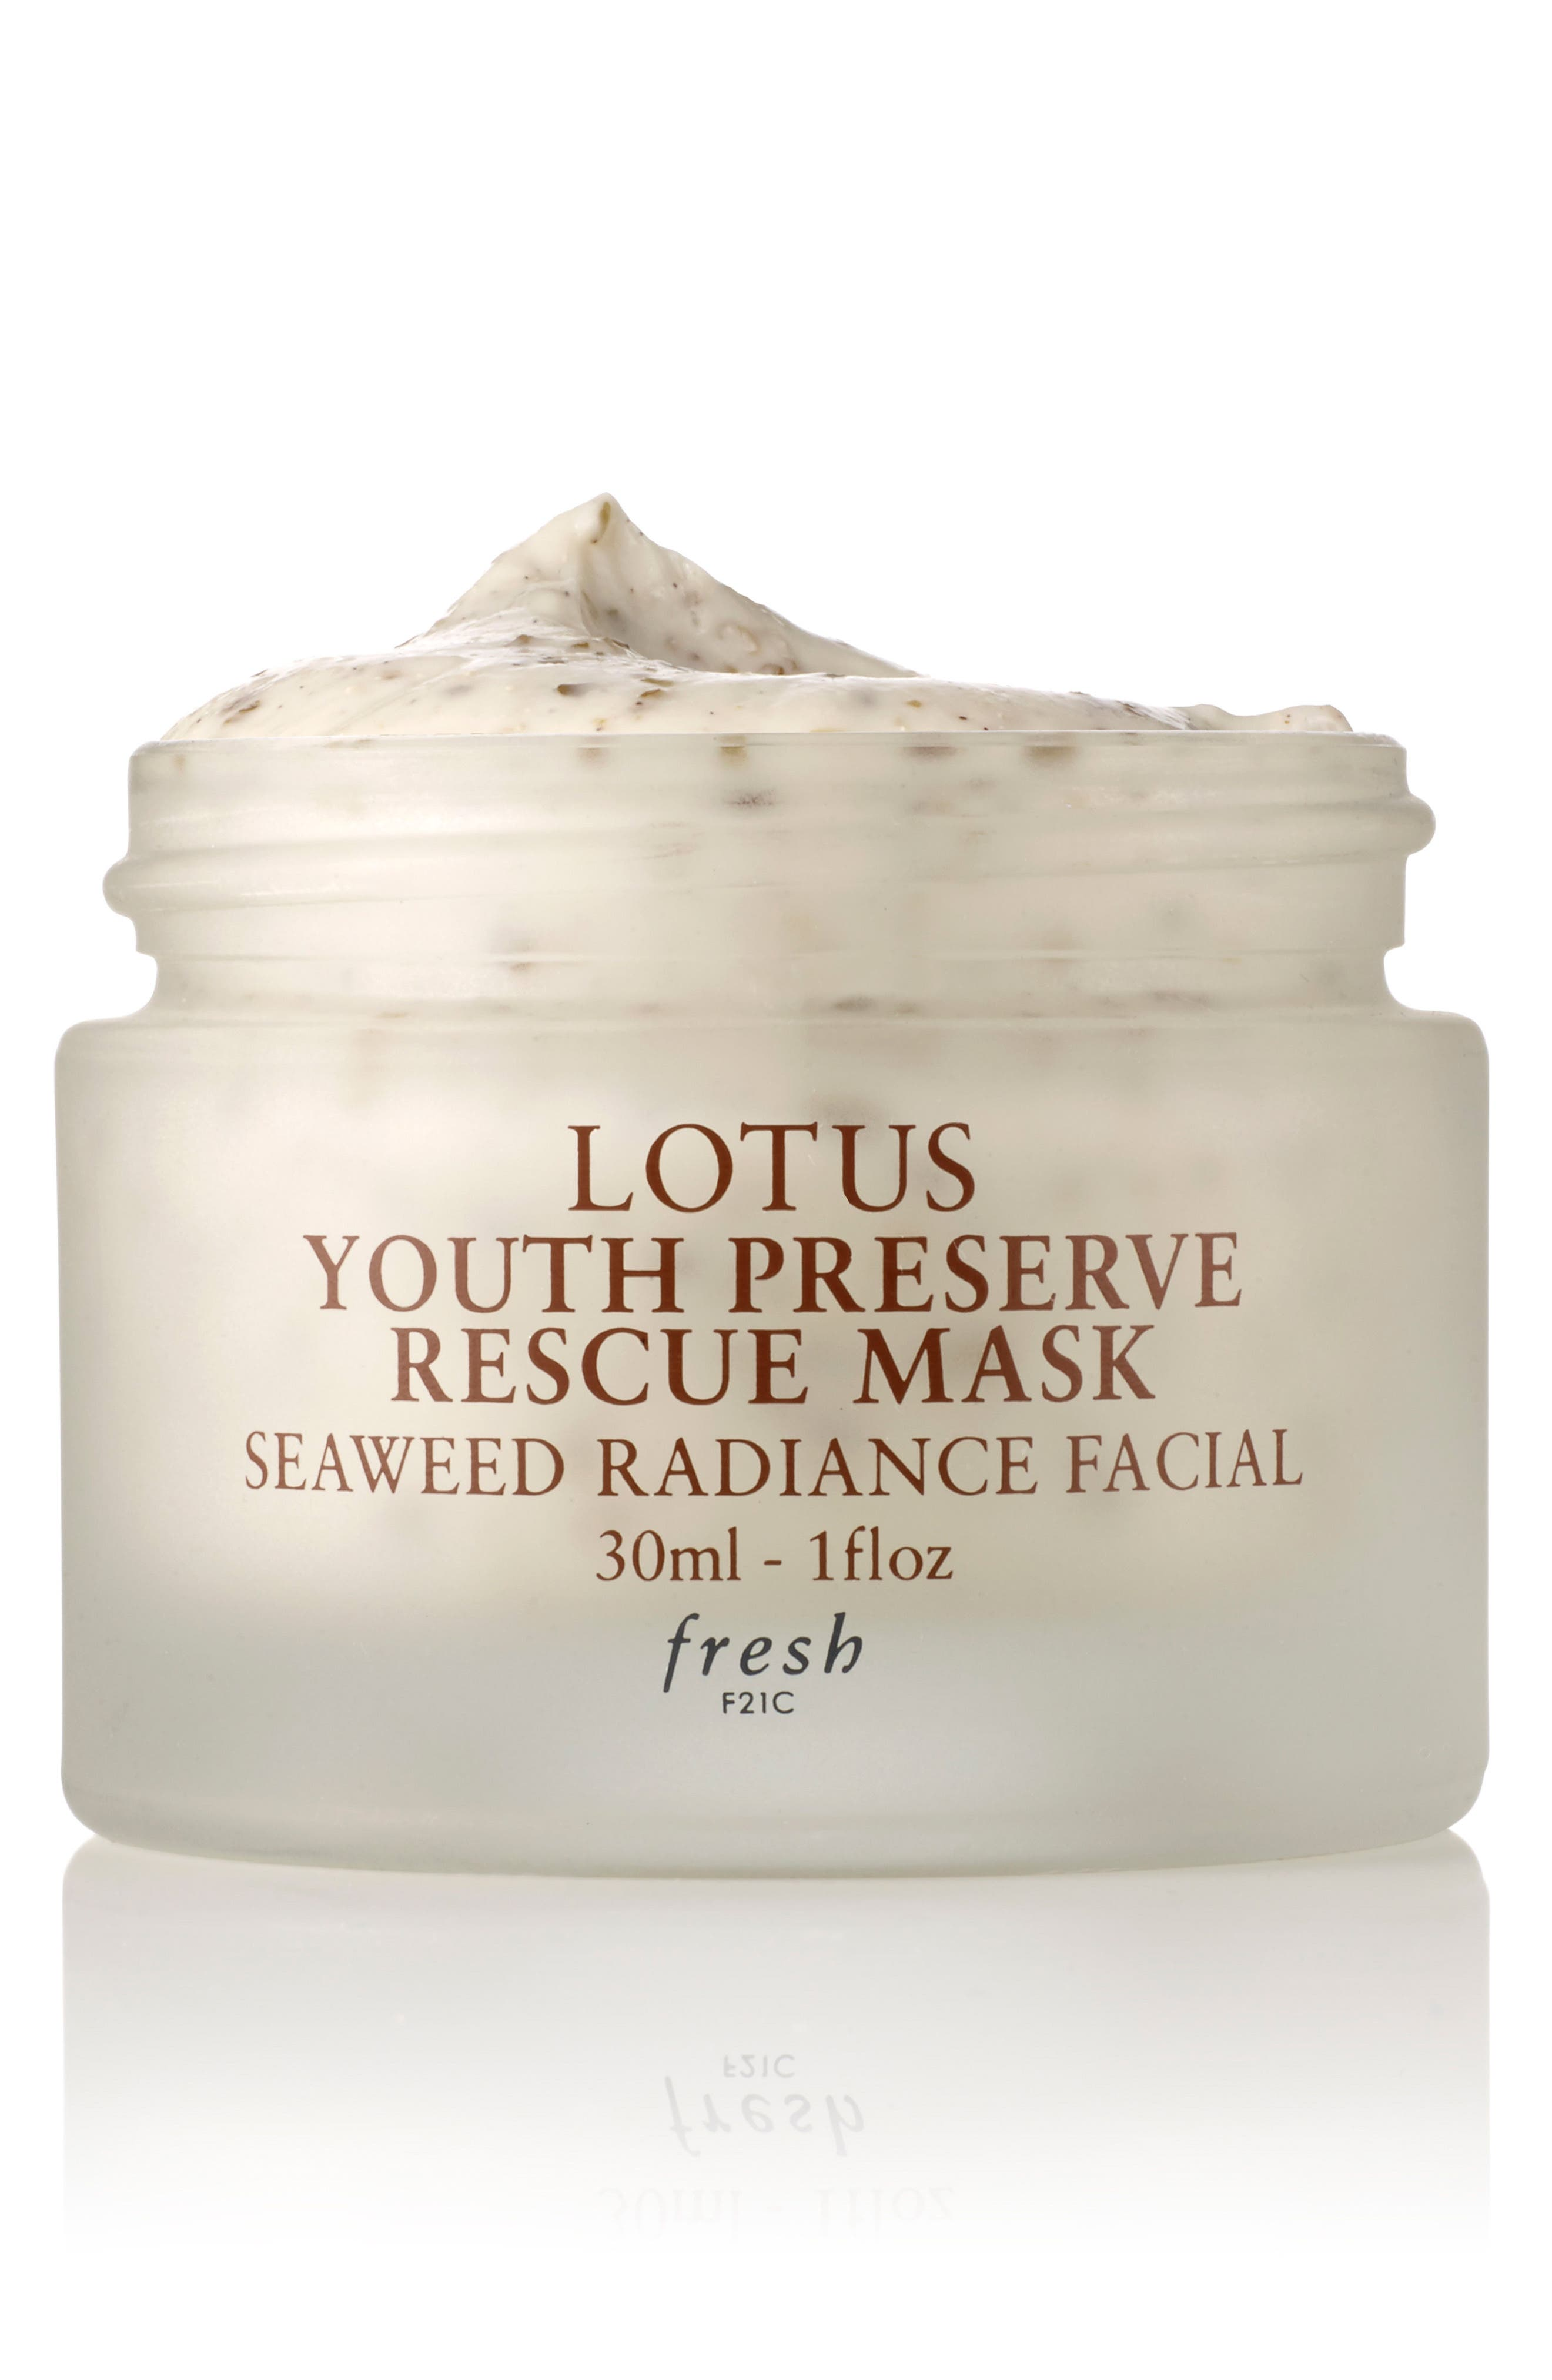 Fresh® Lotus Youth Preserve Rescue Mask